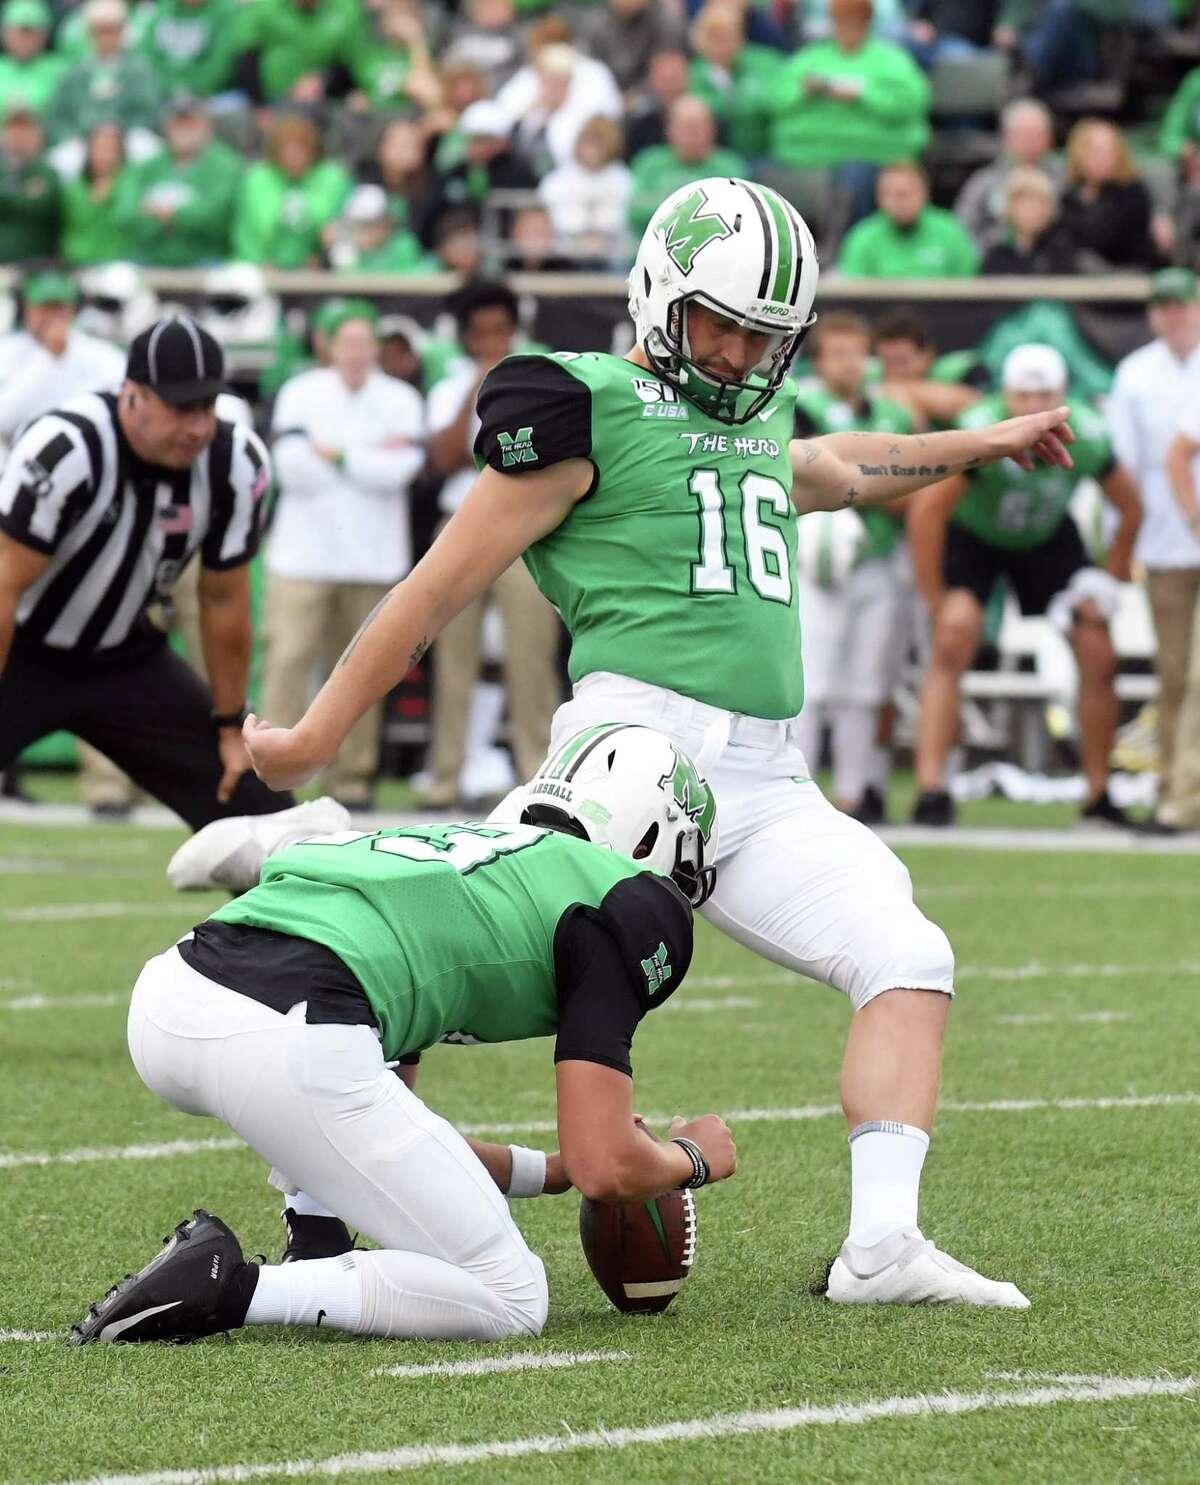 Catholic Central High School graduate Justin Rohrwasser of Clifton Park kicks the ball for Marshall. (Courtesy of Marshall Athletics)